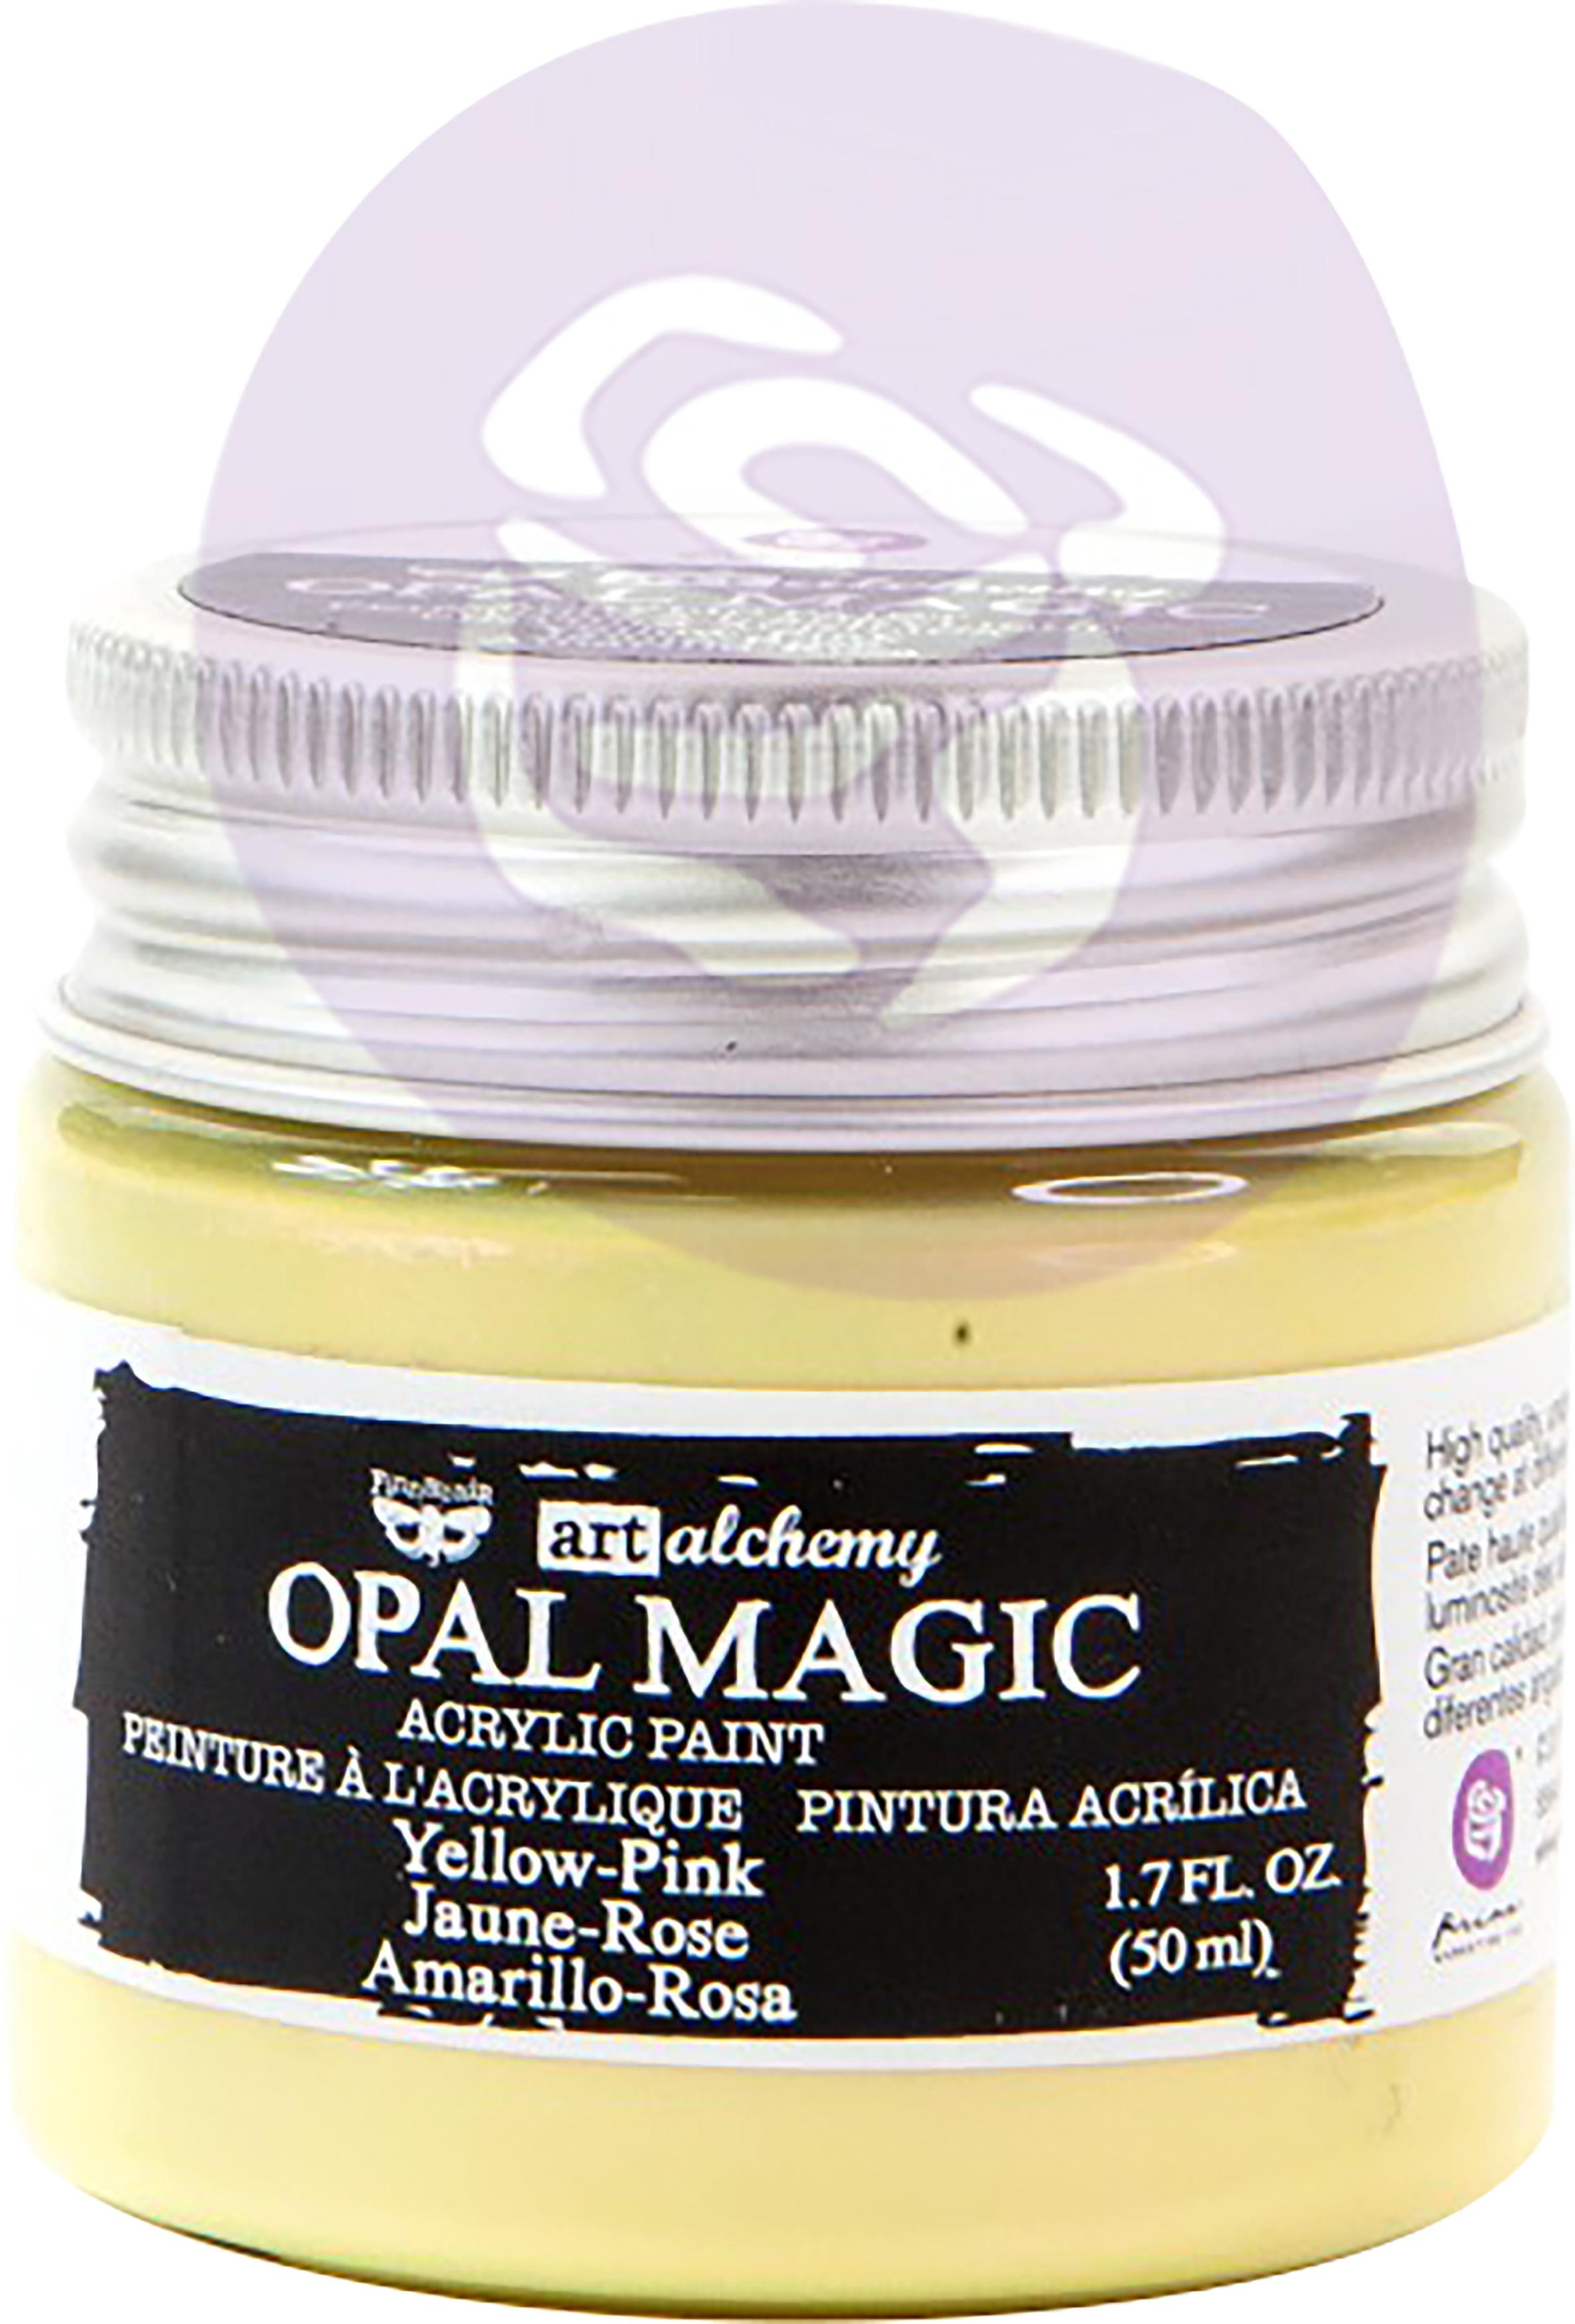 Opal Magic - Yellow/Pink